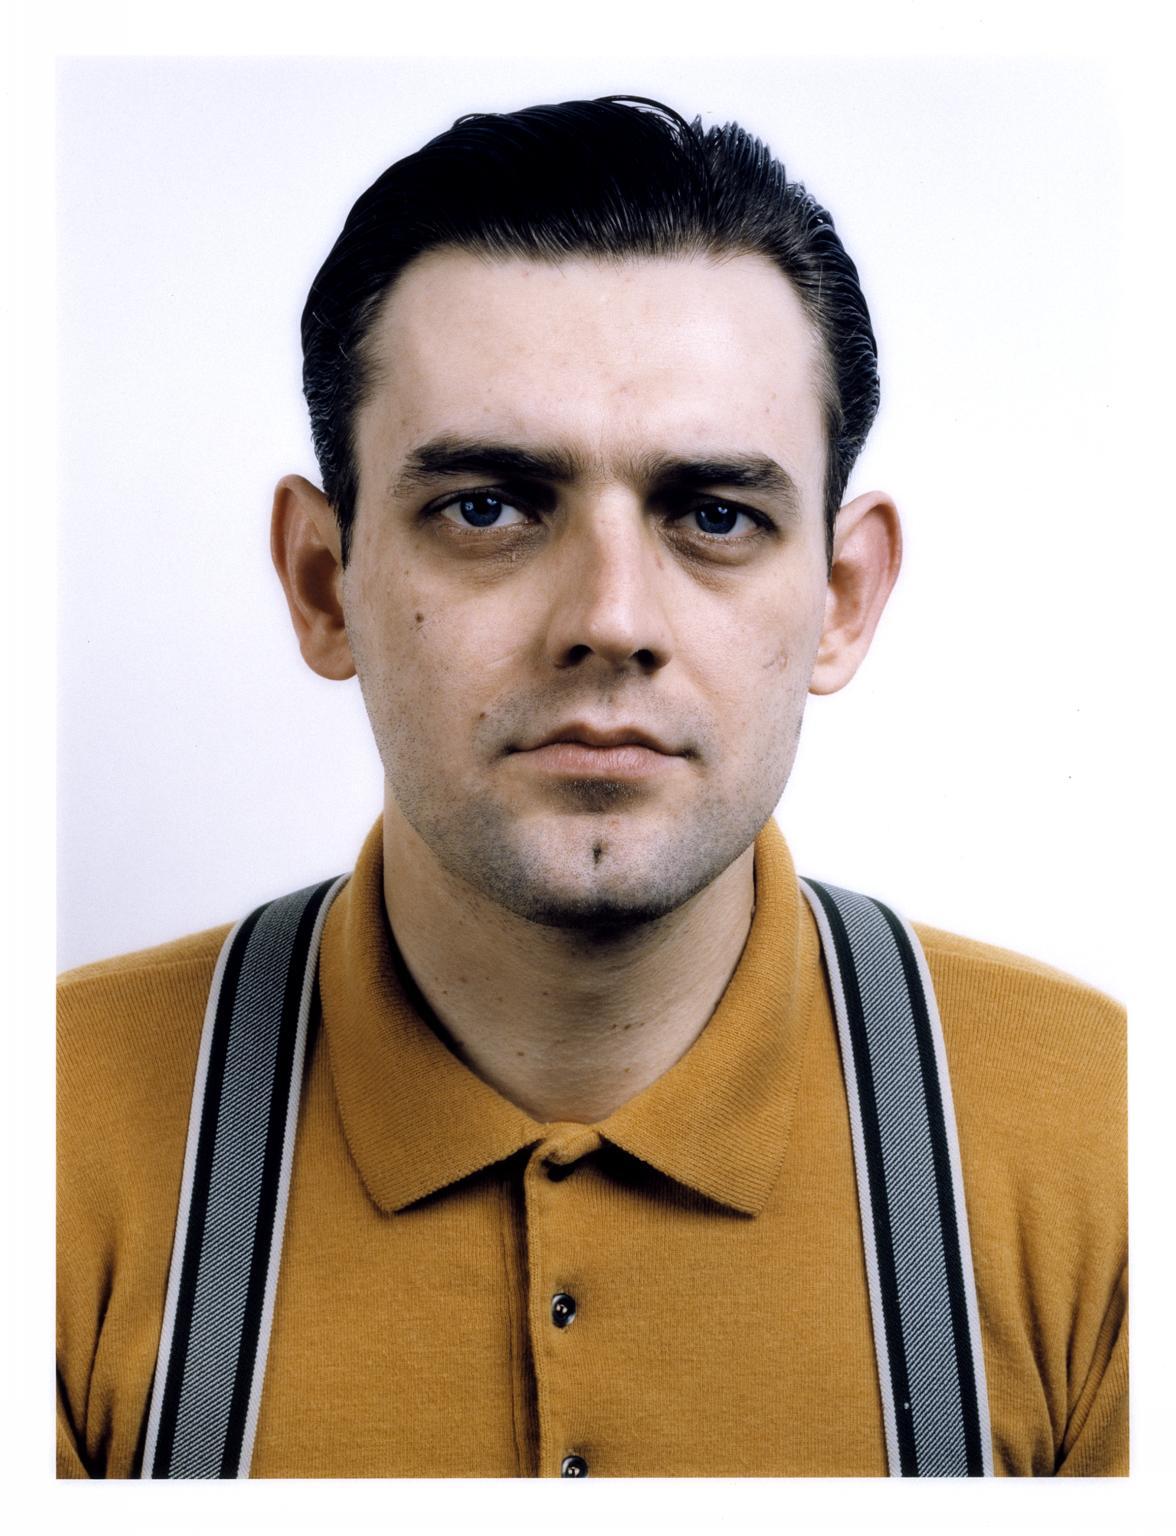 Thomas Ruff, 'Portrait 1986 (Stoya)' 1986